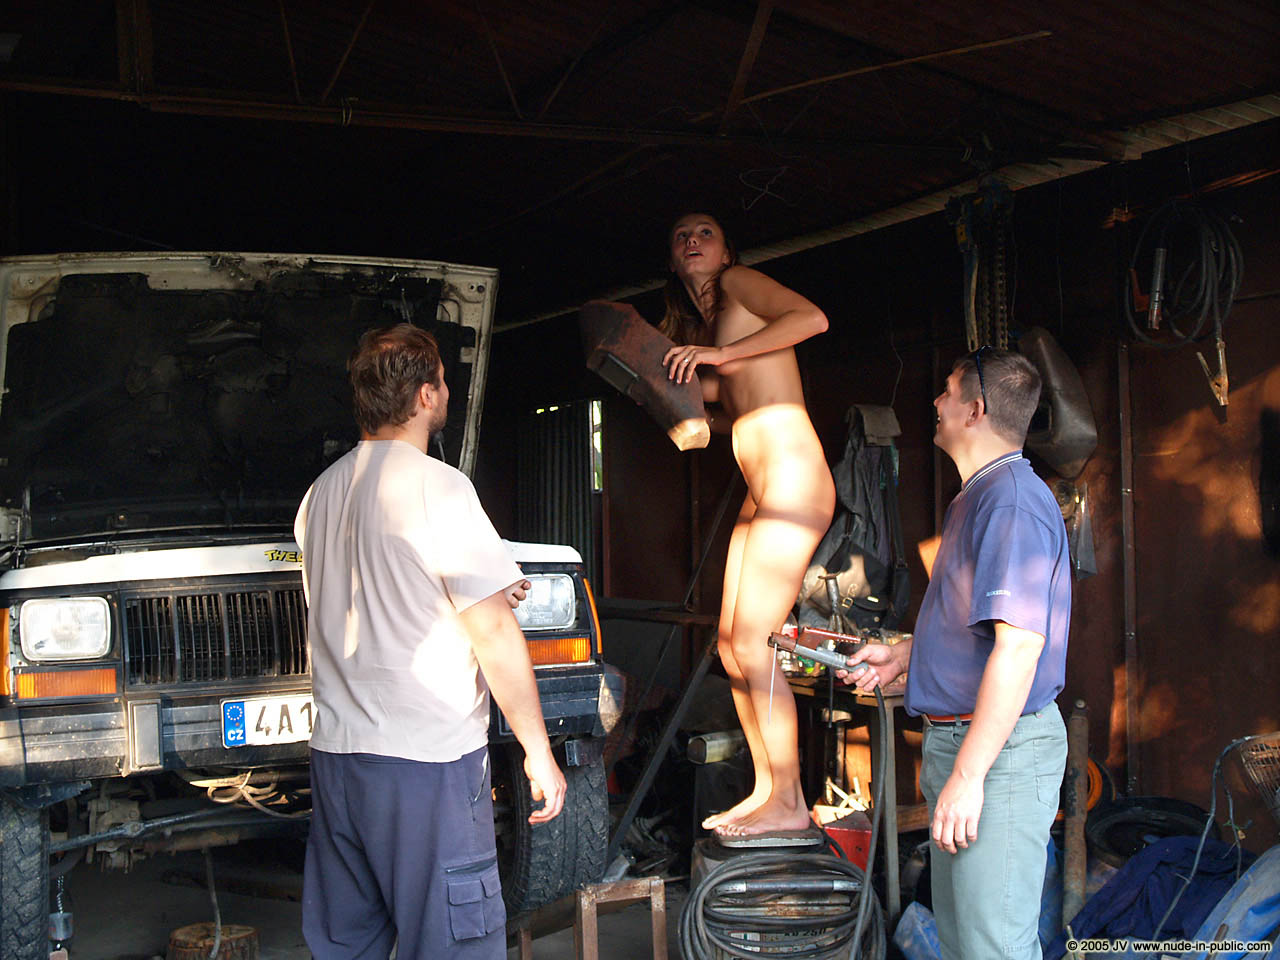 veronika-e-junkyard-cars-mechanic-nude-in-public-18